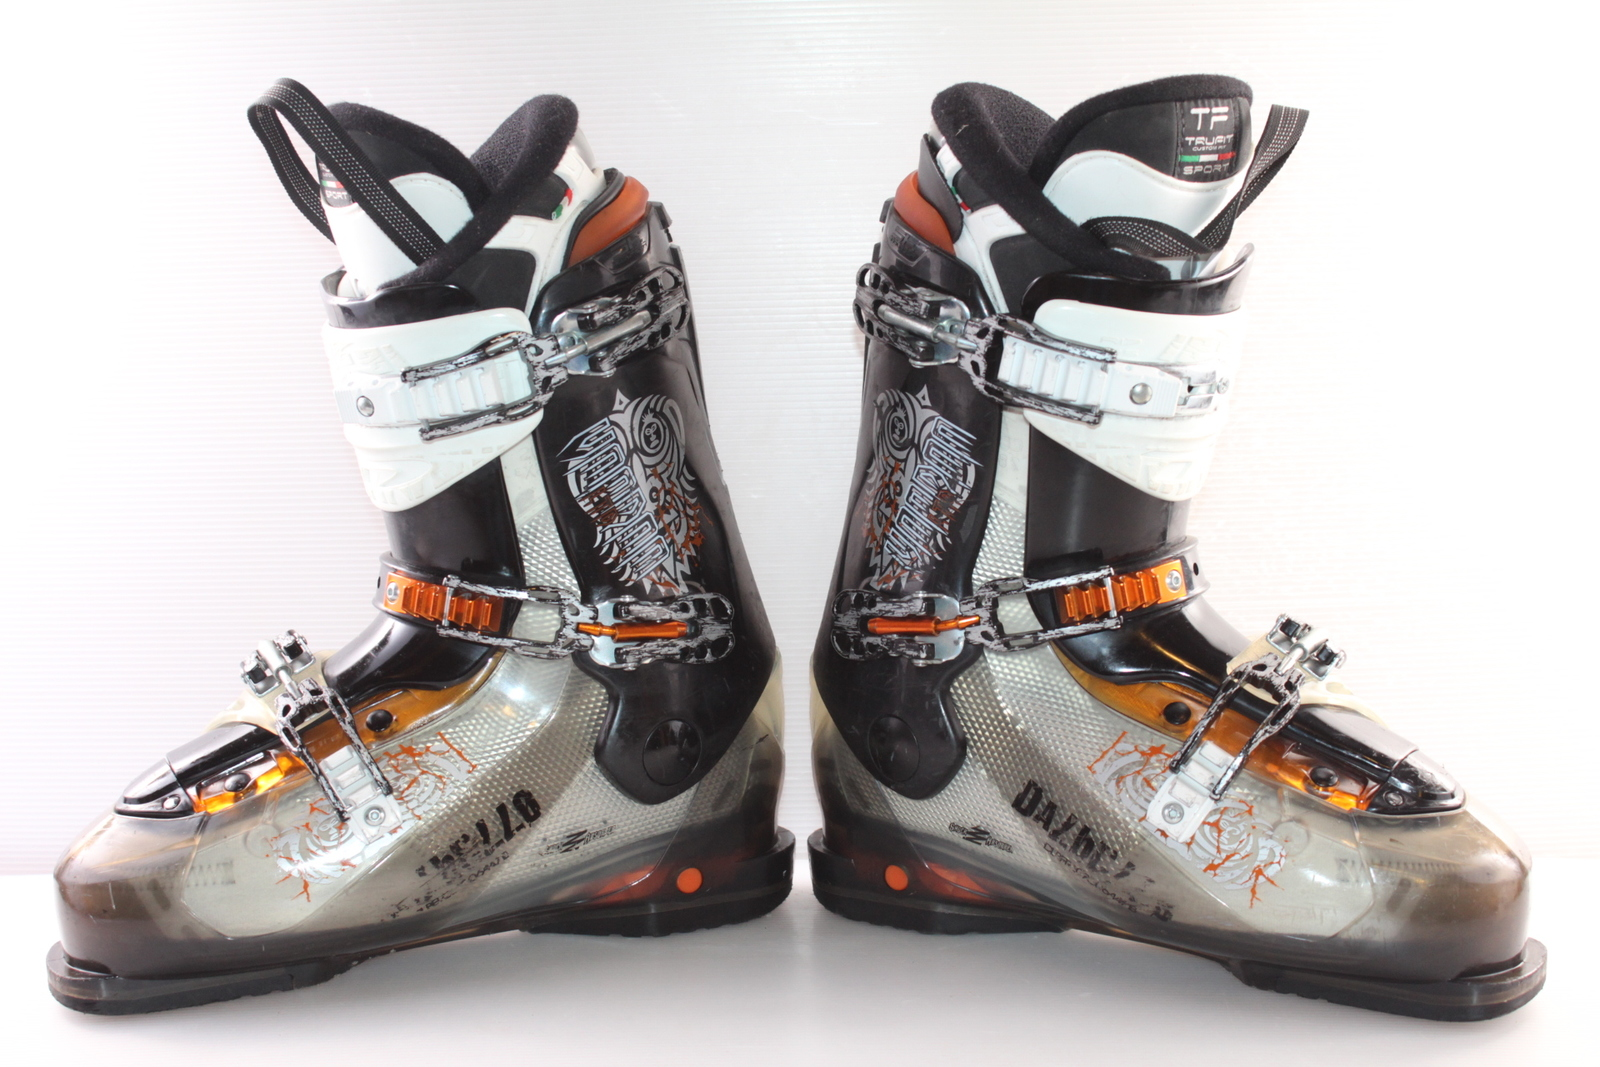 Lyžařské boty Dalbello Voodoo LTD vel. EU43.5